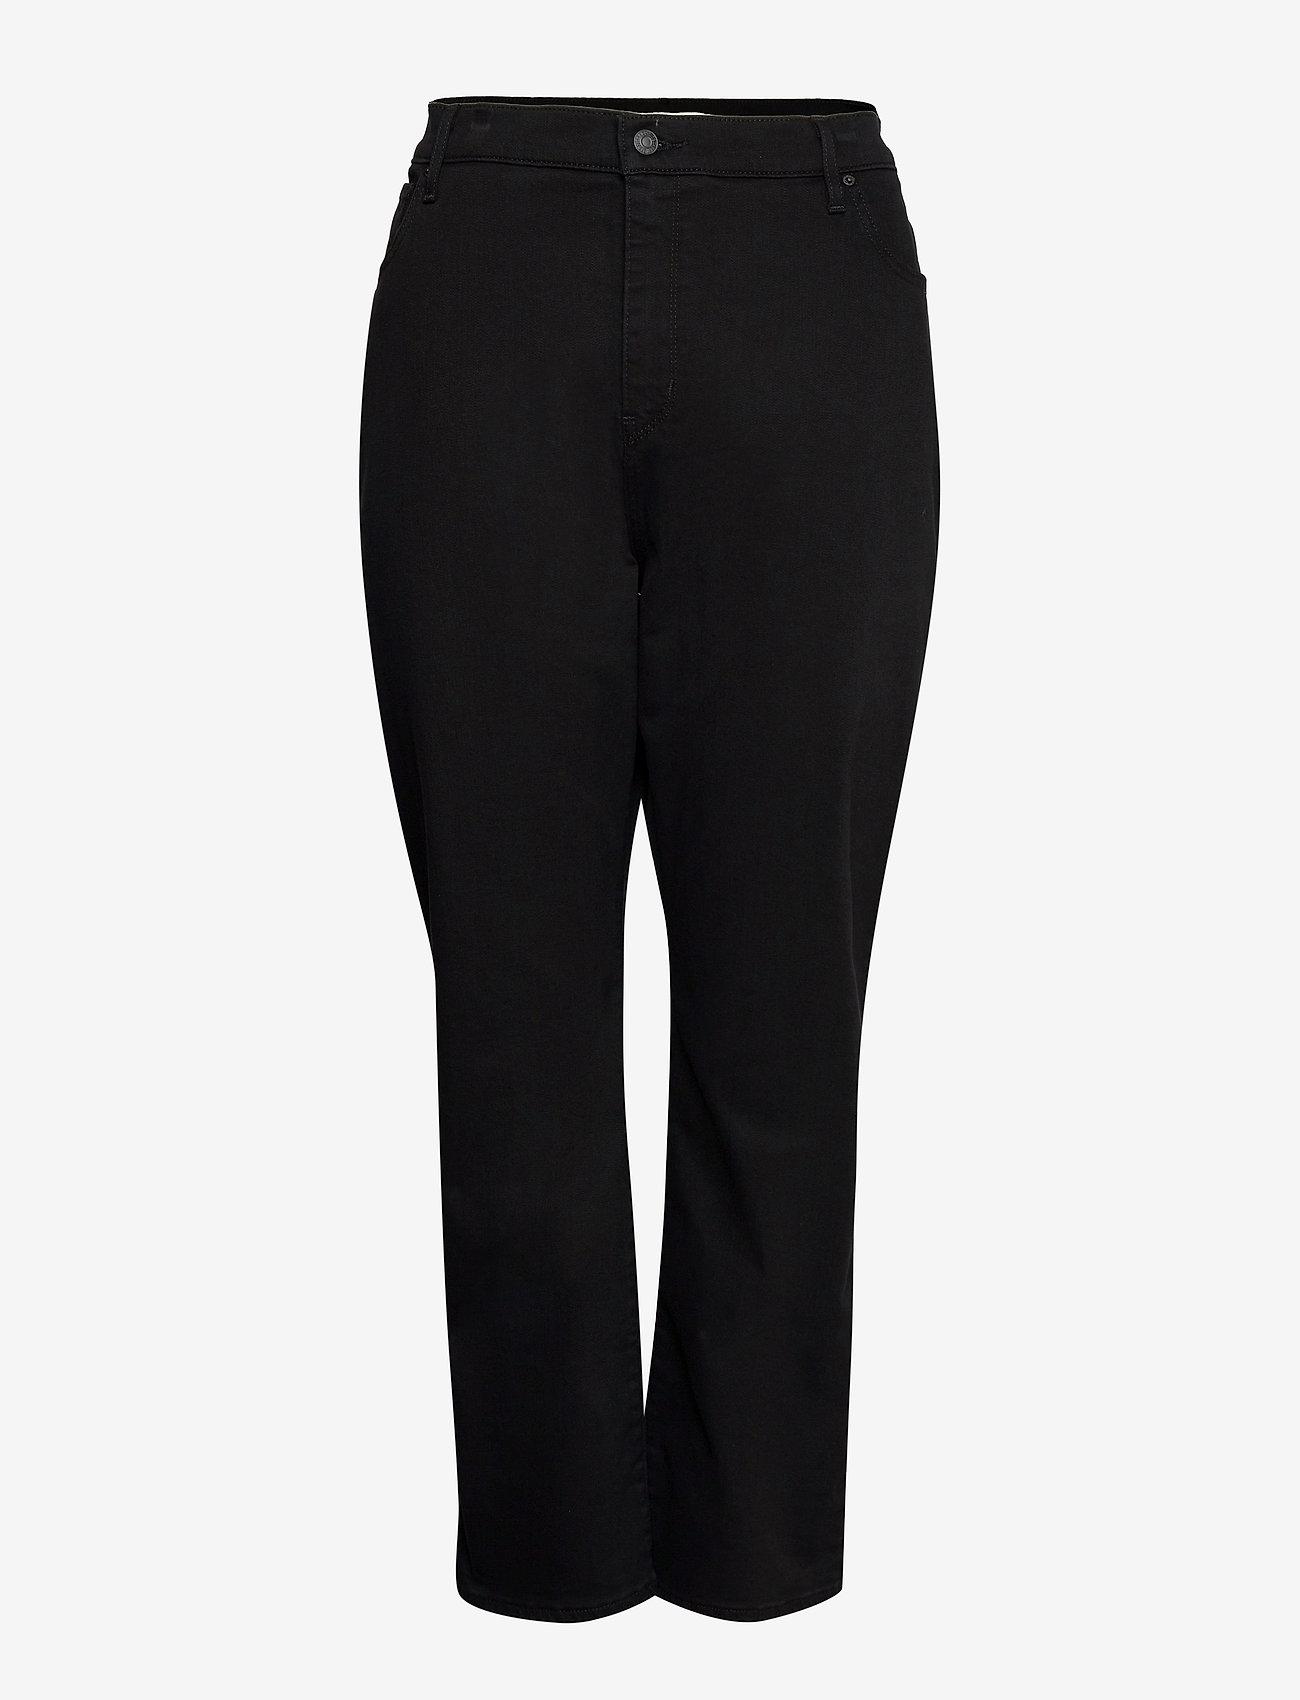 Levi's Plus Size - 724 PL HR STRAIGHT NIGHT IS BL - straight jeans - blacks - 0